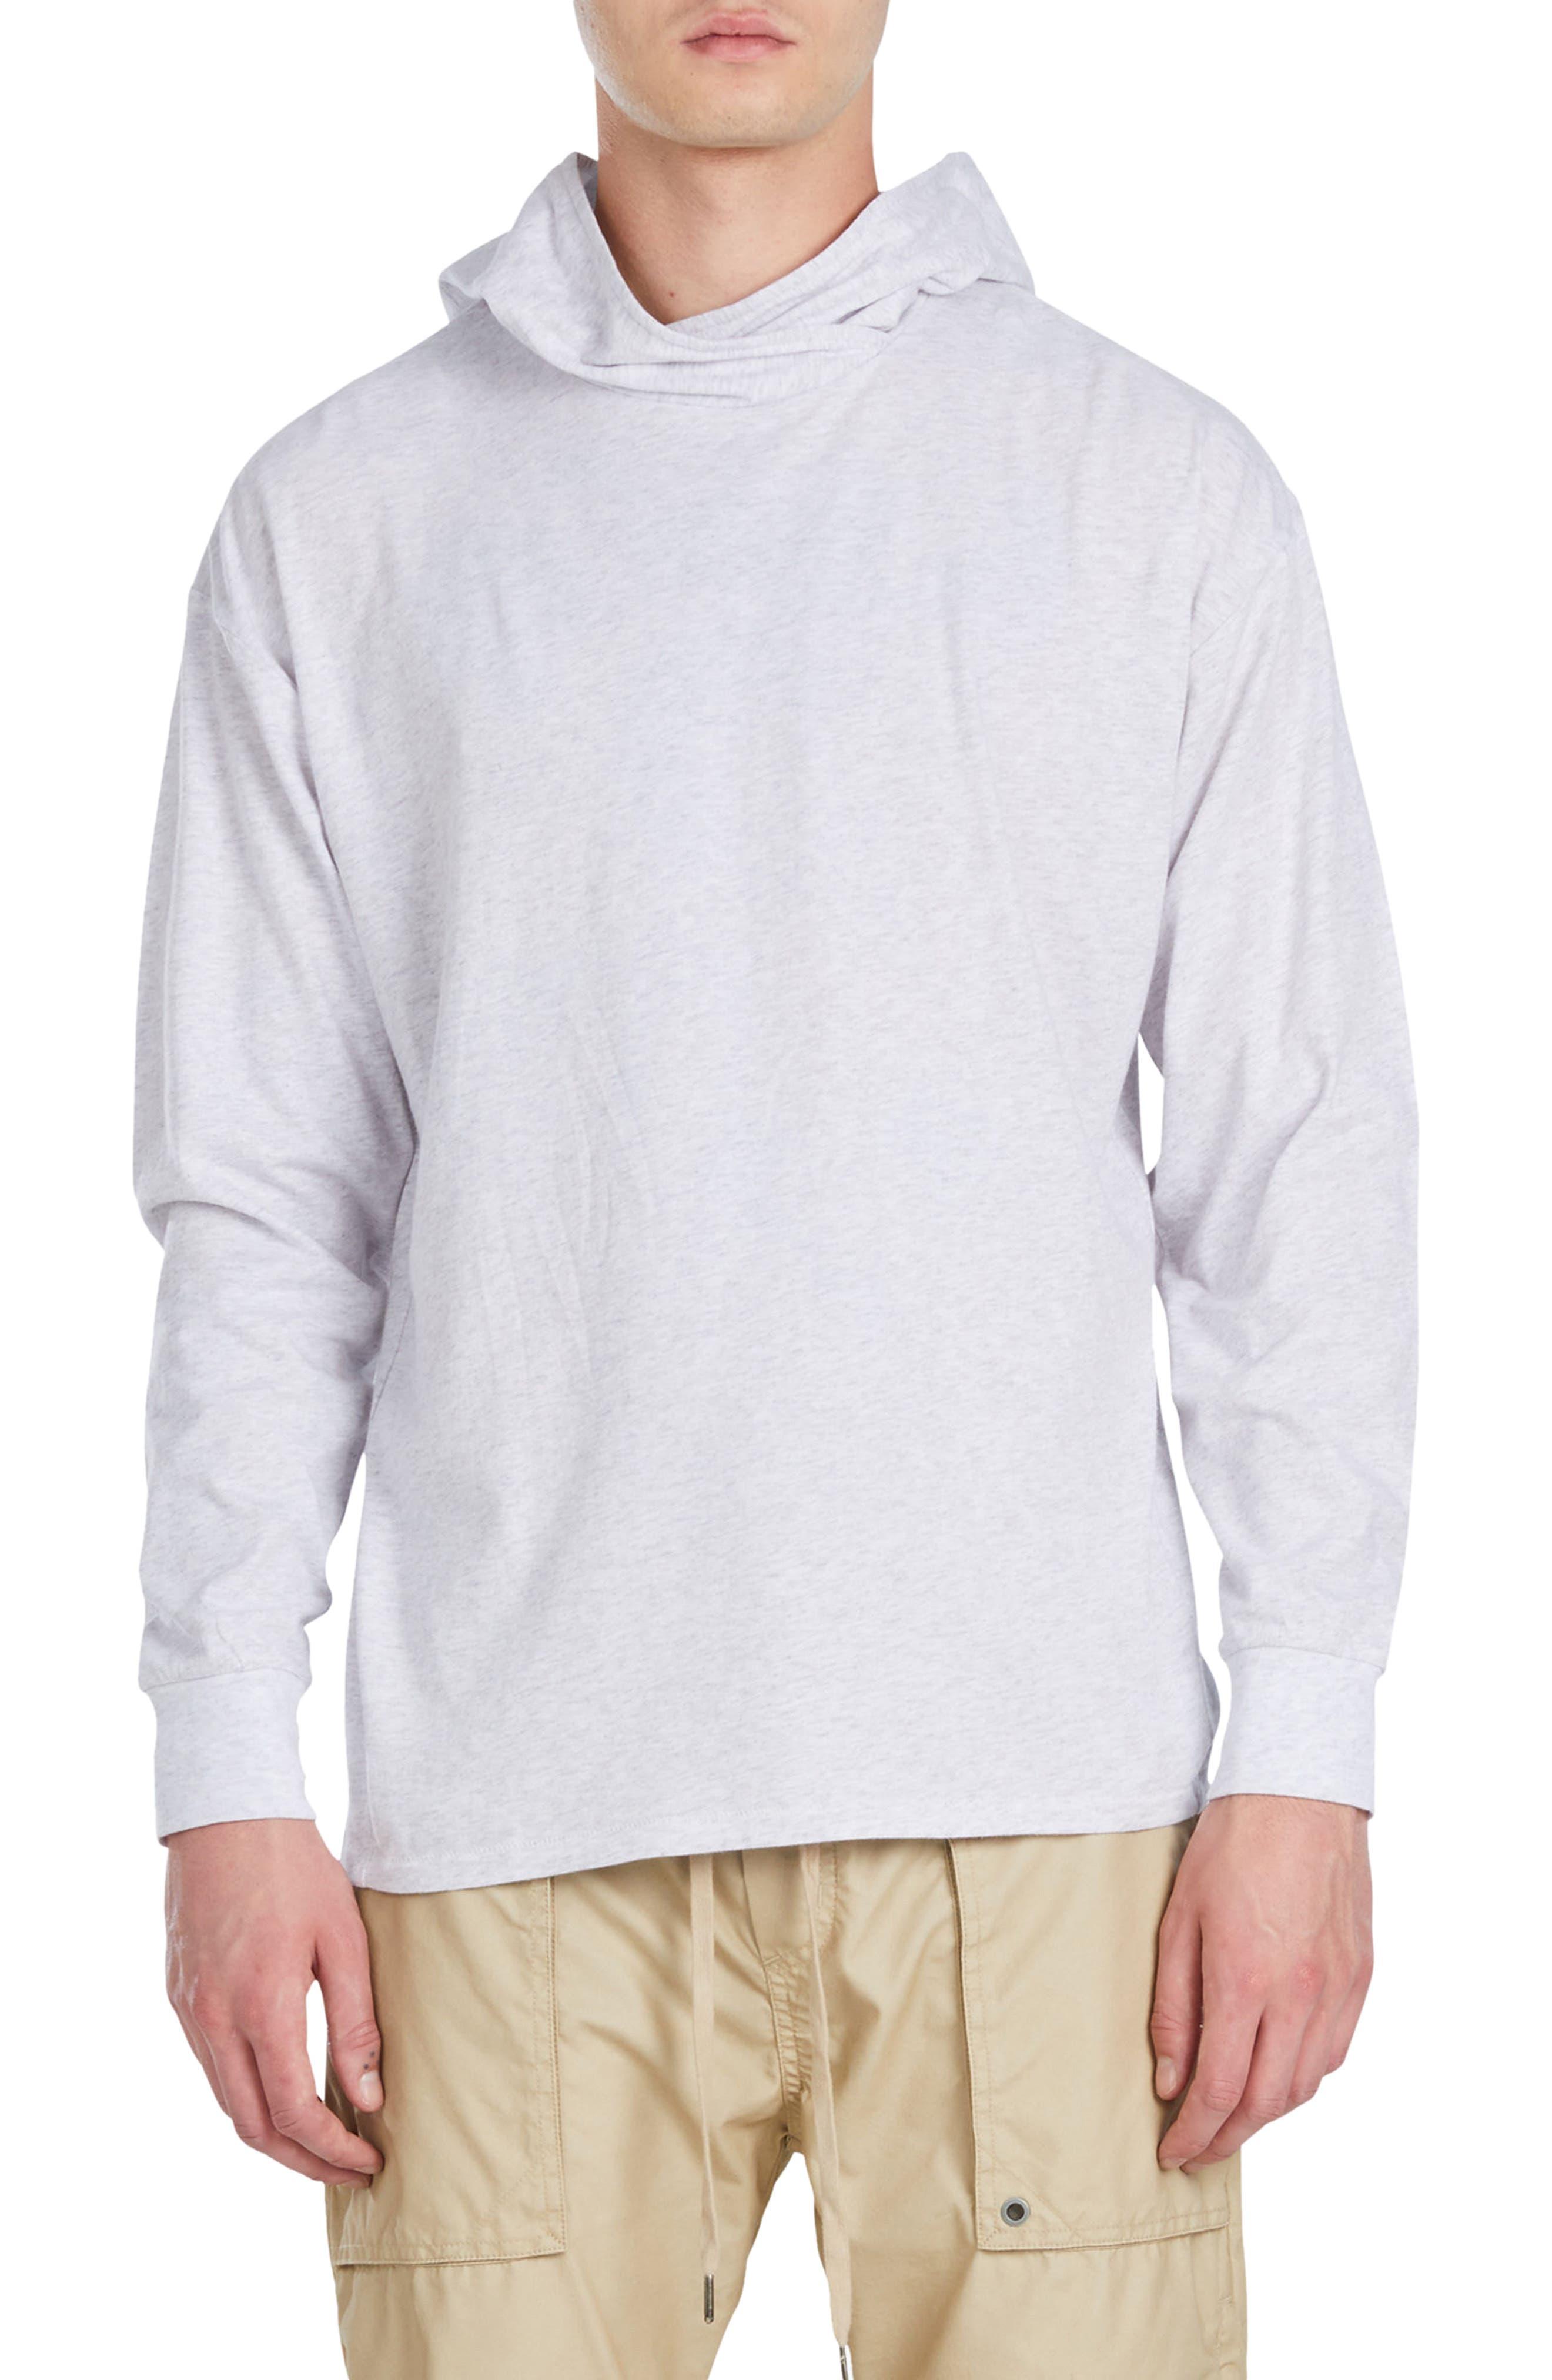 Rugger Long Sleeve Hooded T-Shirt,                         Main,                         color, 051